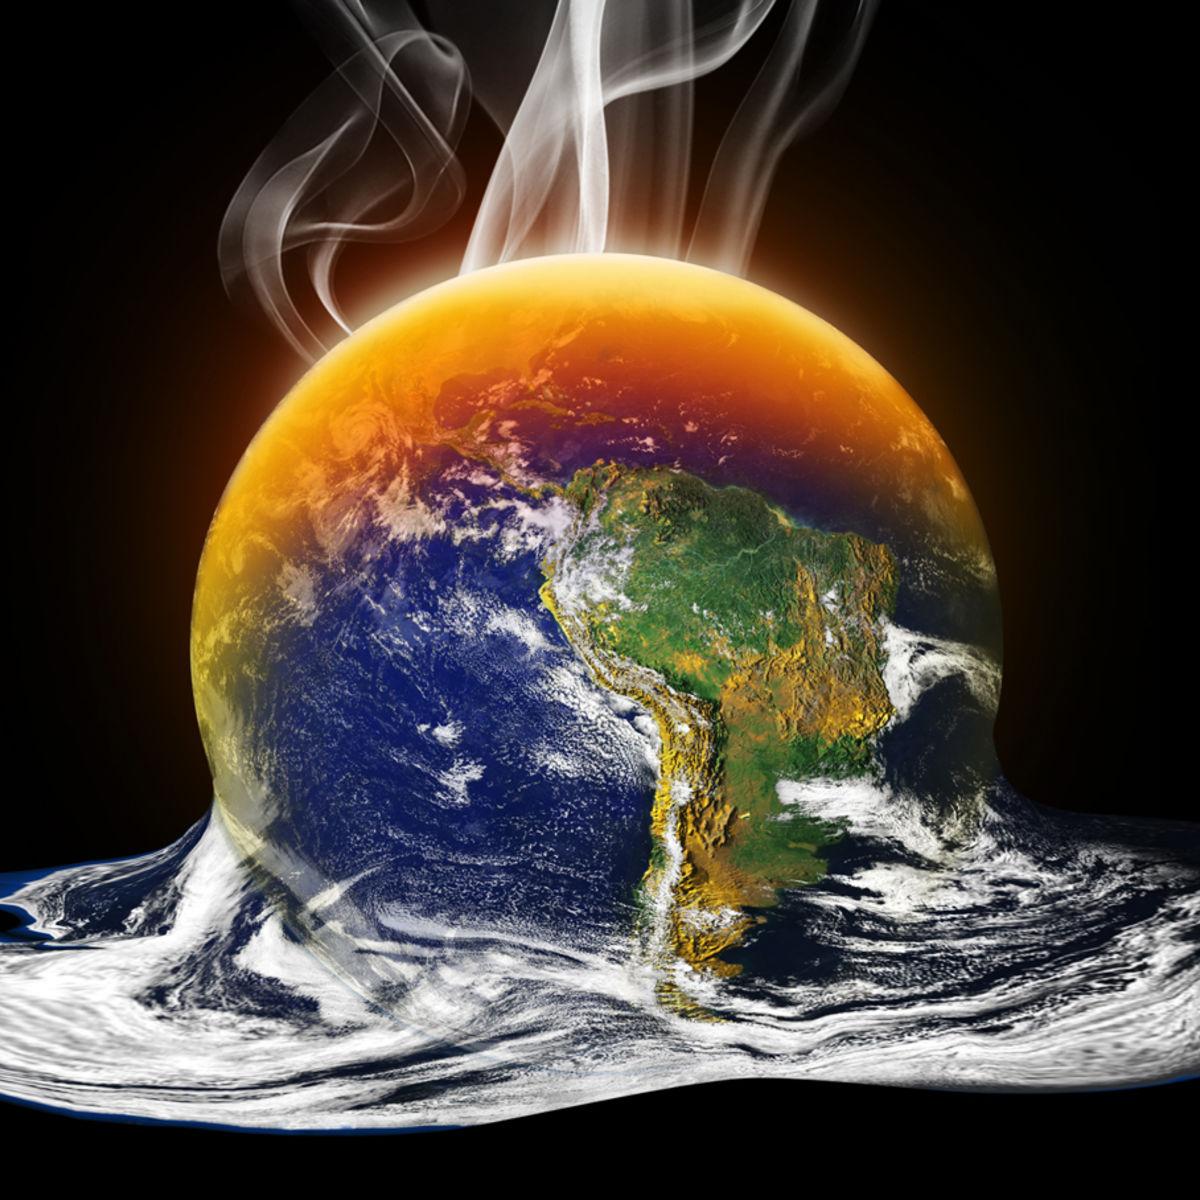 illustration of Earth melting